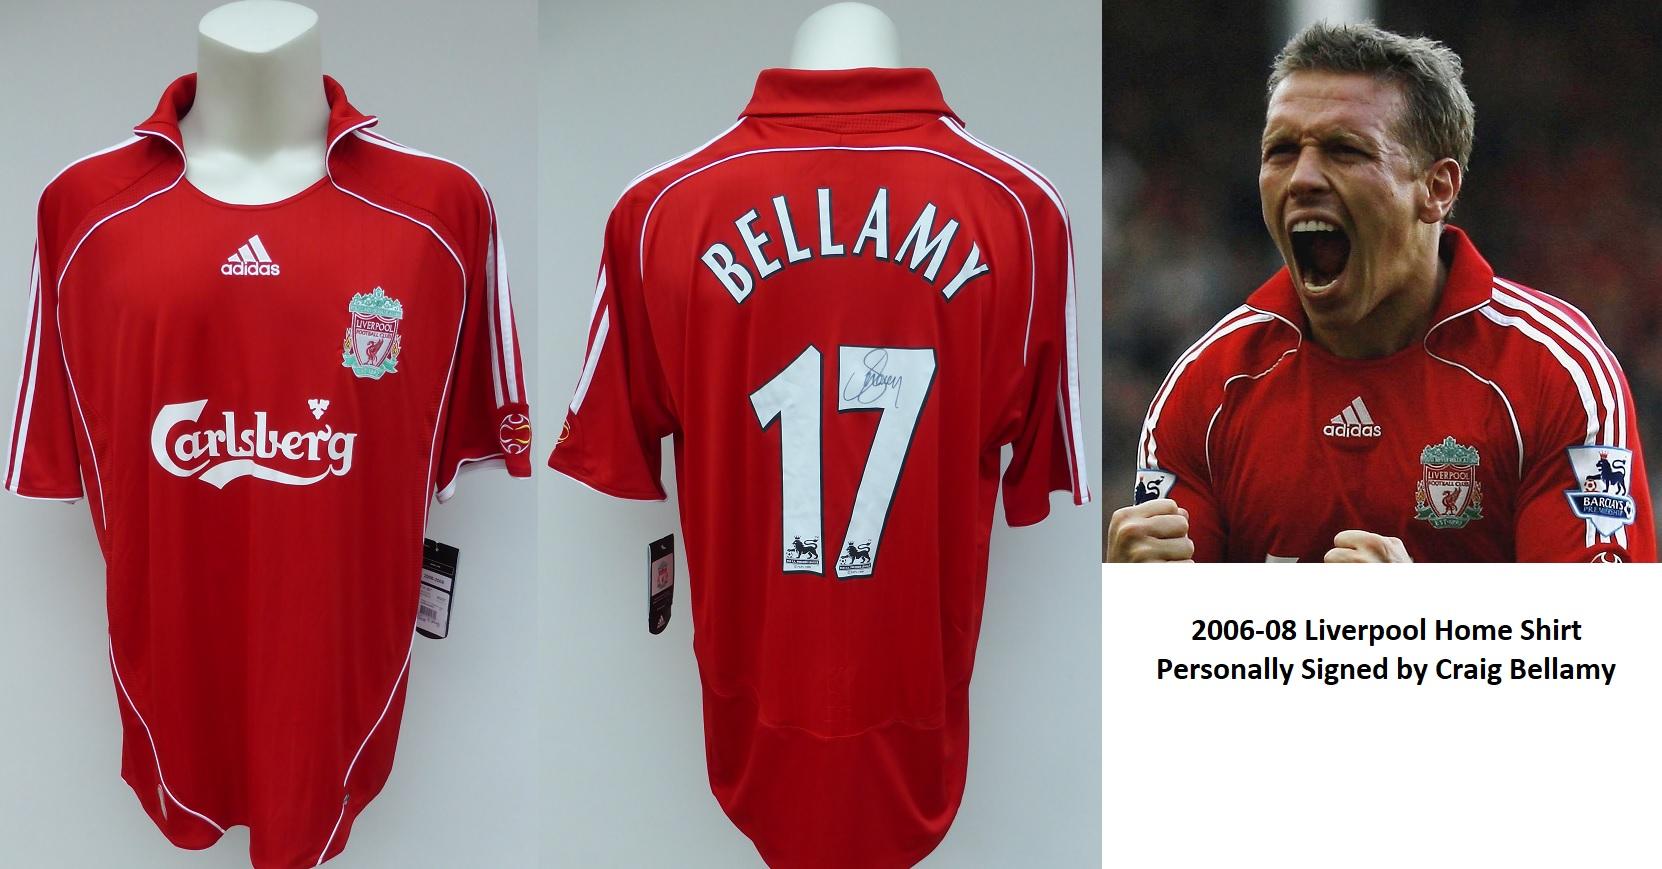 92fb6a08c 2006-08 Liverpool Home Shirt Signed by Craig Bellamy No.17 with COA ...